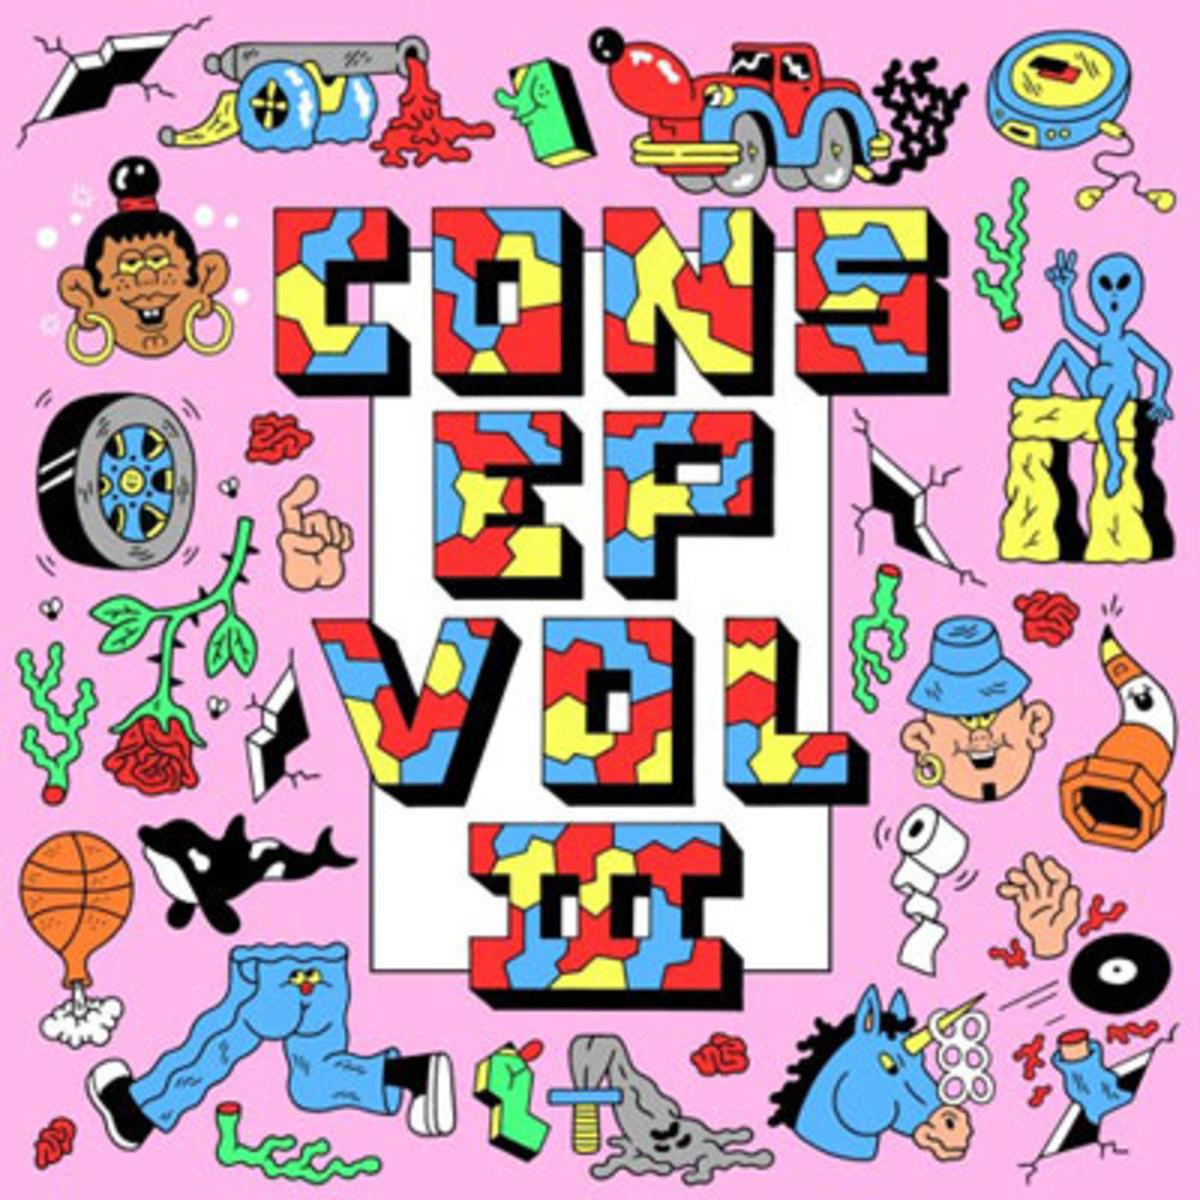 converse-cons-ep-vol-3.jpg